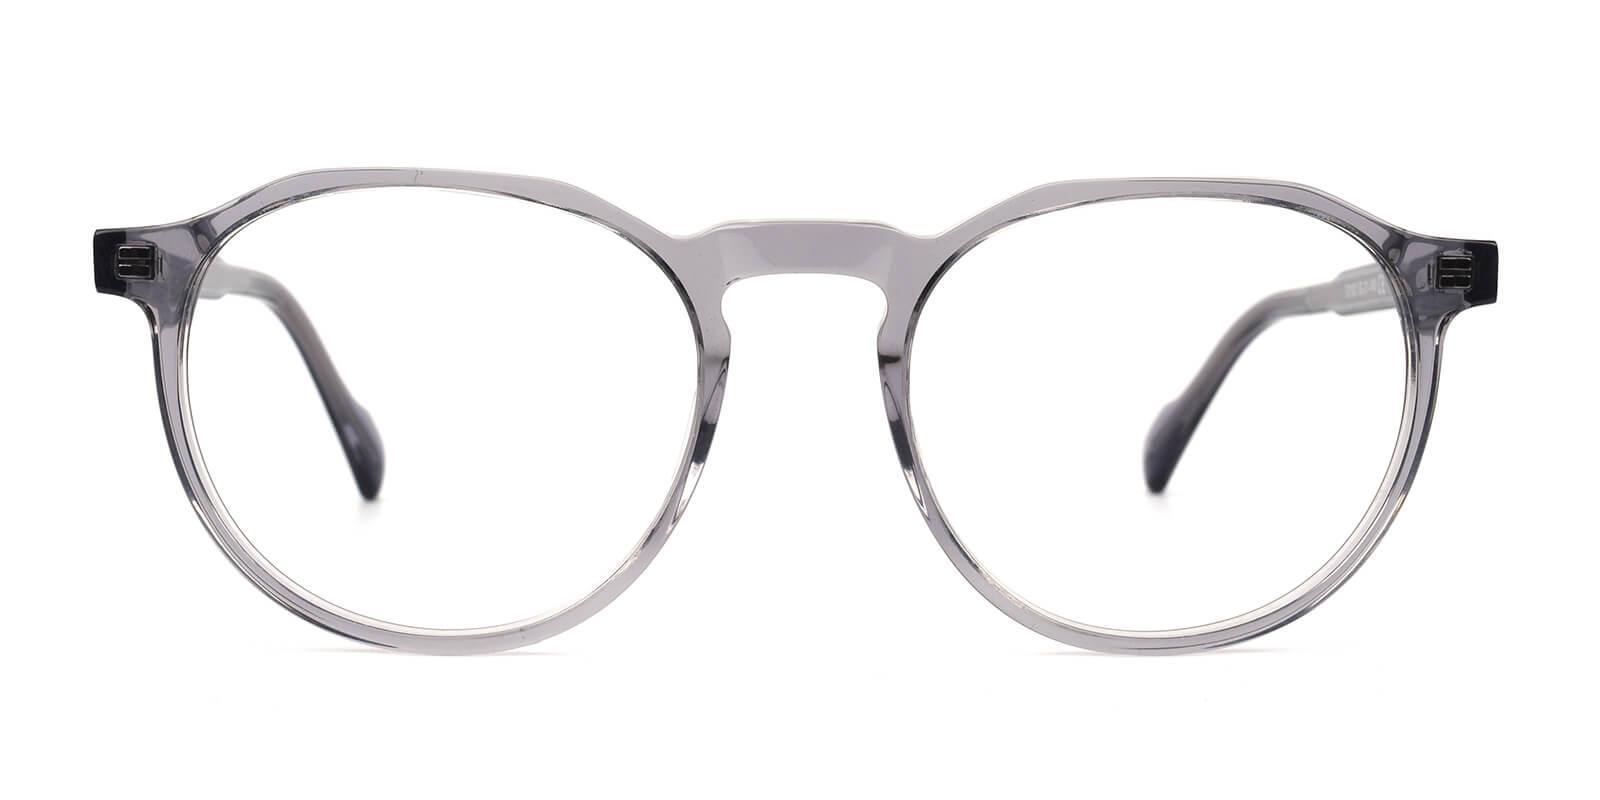 Merimis-Gray-Round-TR-Eyeglasses-detail